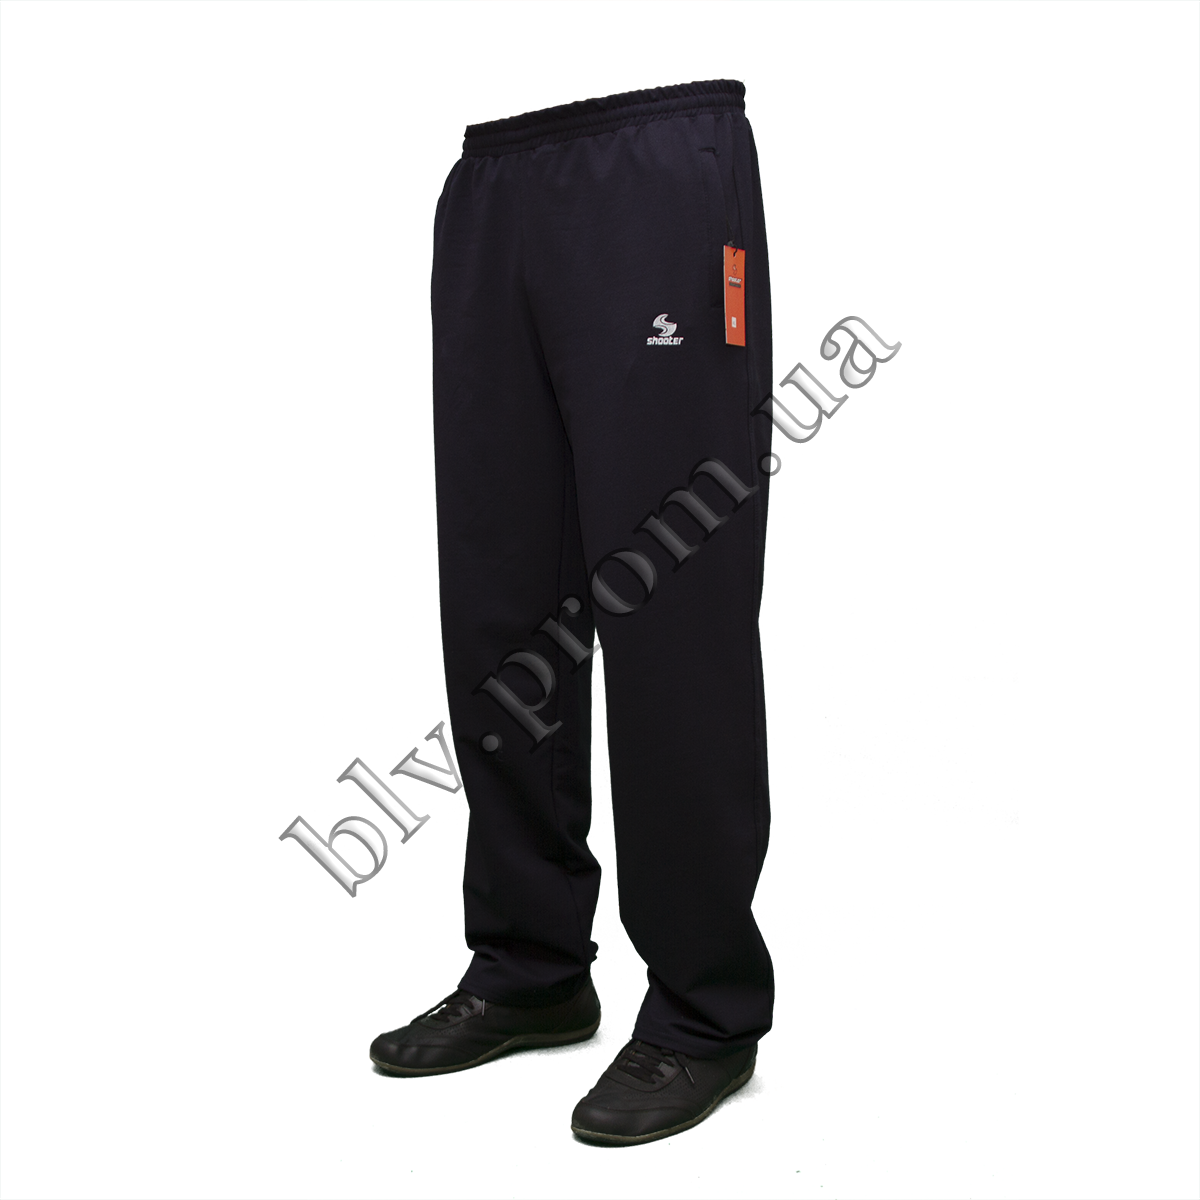 Трикотажные мужские брюки Баталы тм. Shooter  2524G